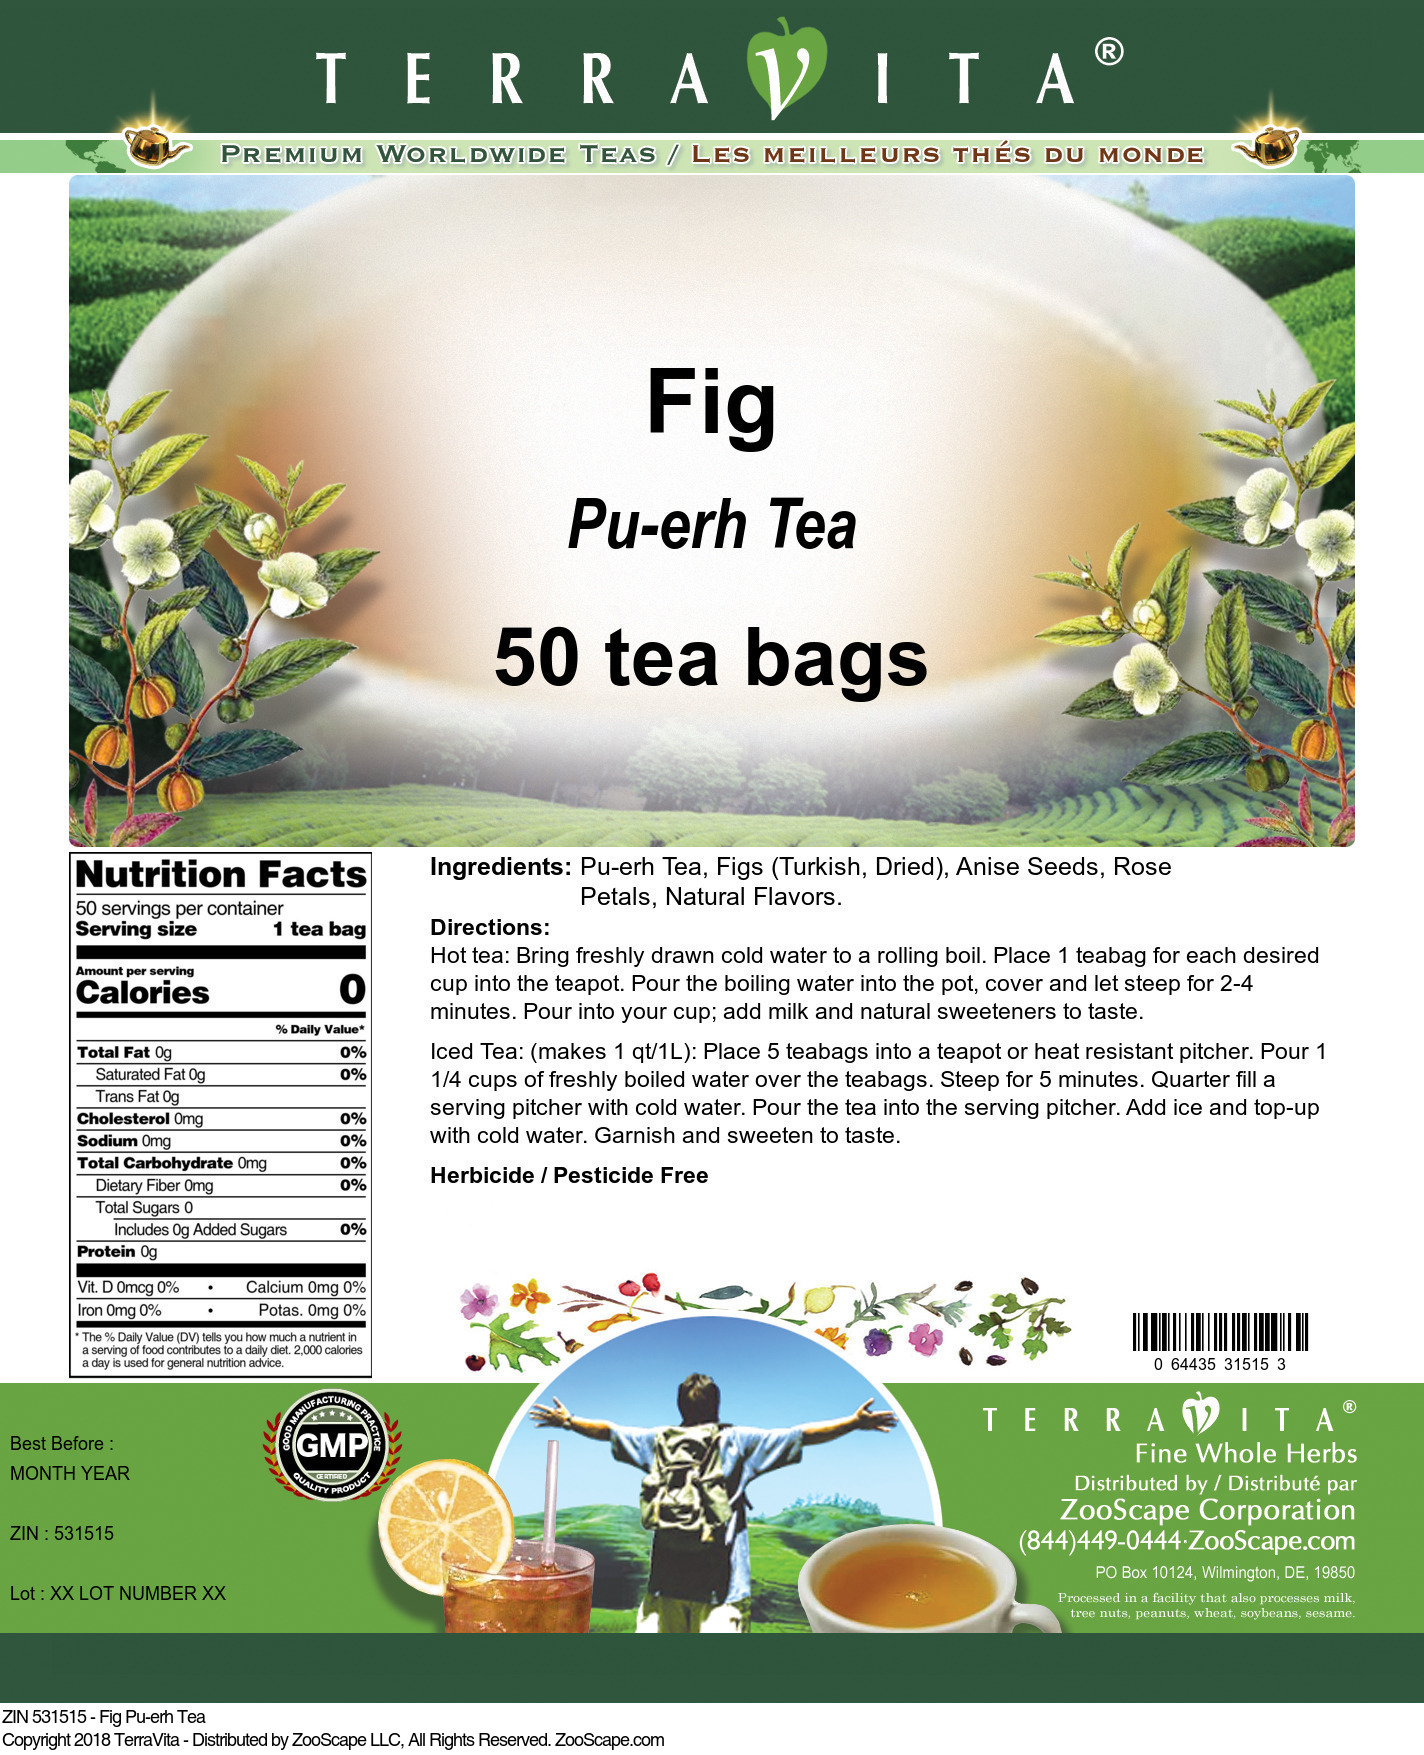 Fig Pu-erh Tea